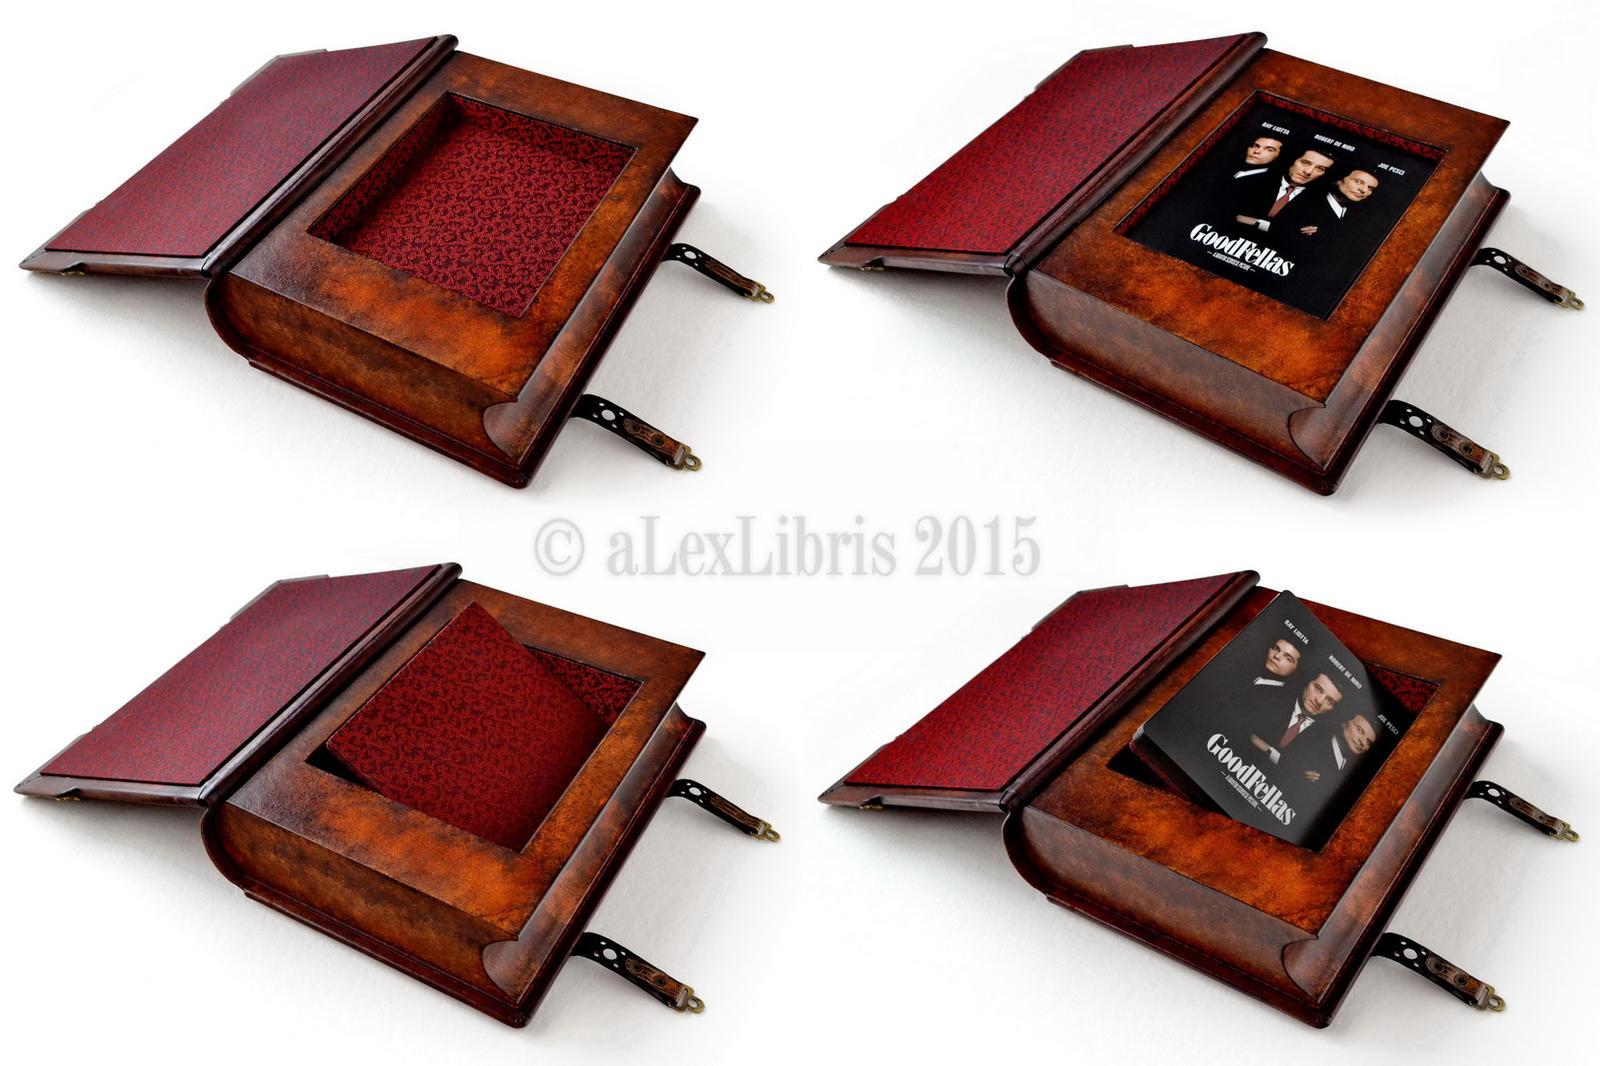 Leather book / box by alexlibris999 on DeviantArt